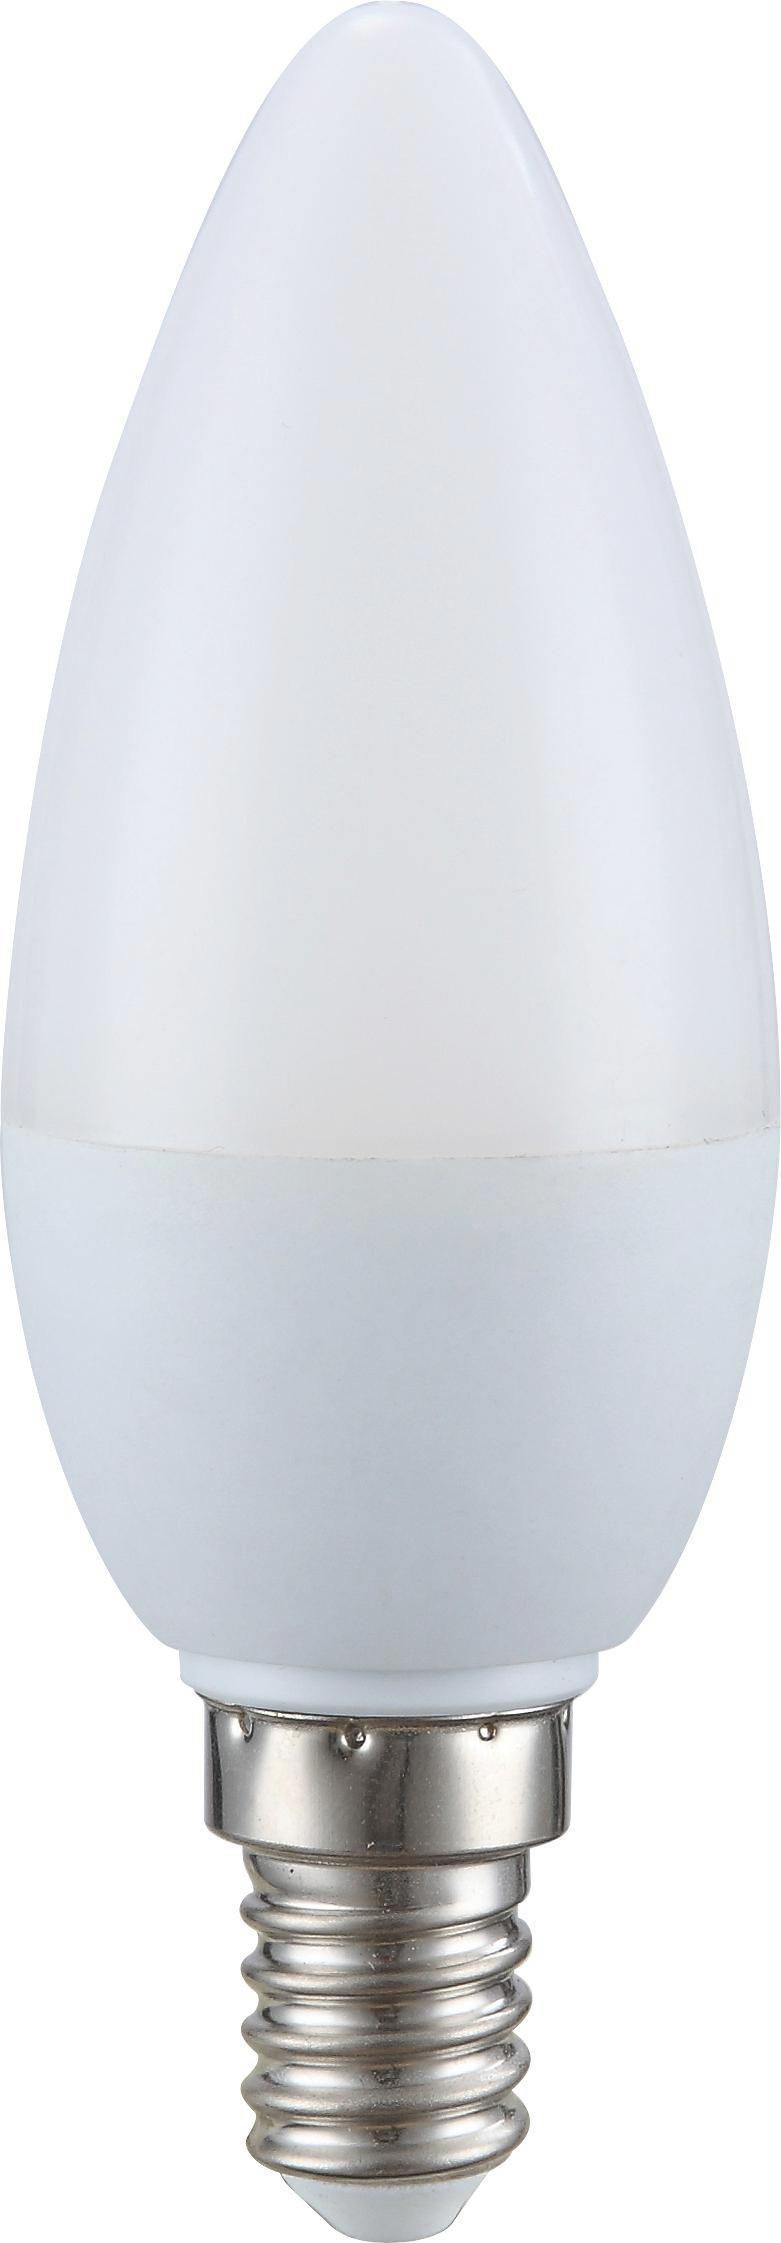 Led-izzó Multi - fehér (0,37/1,00cm) - MÖMAX modern living